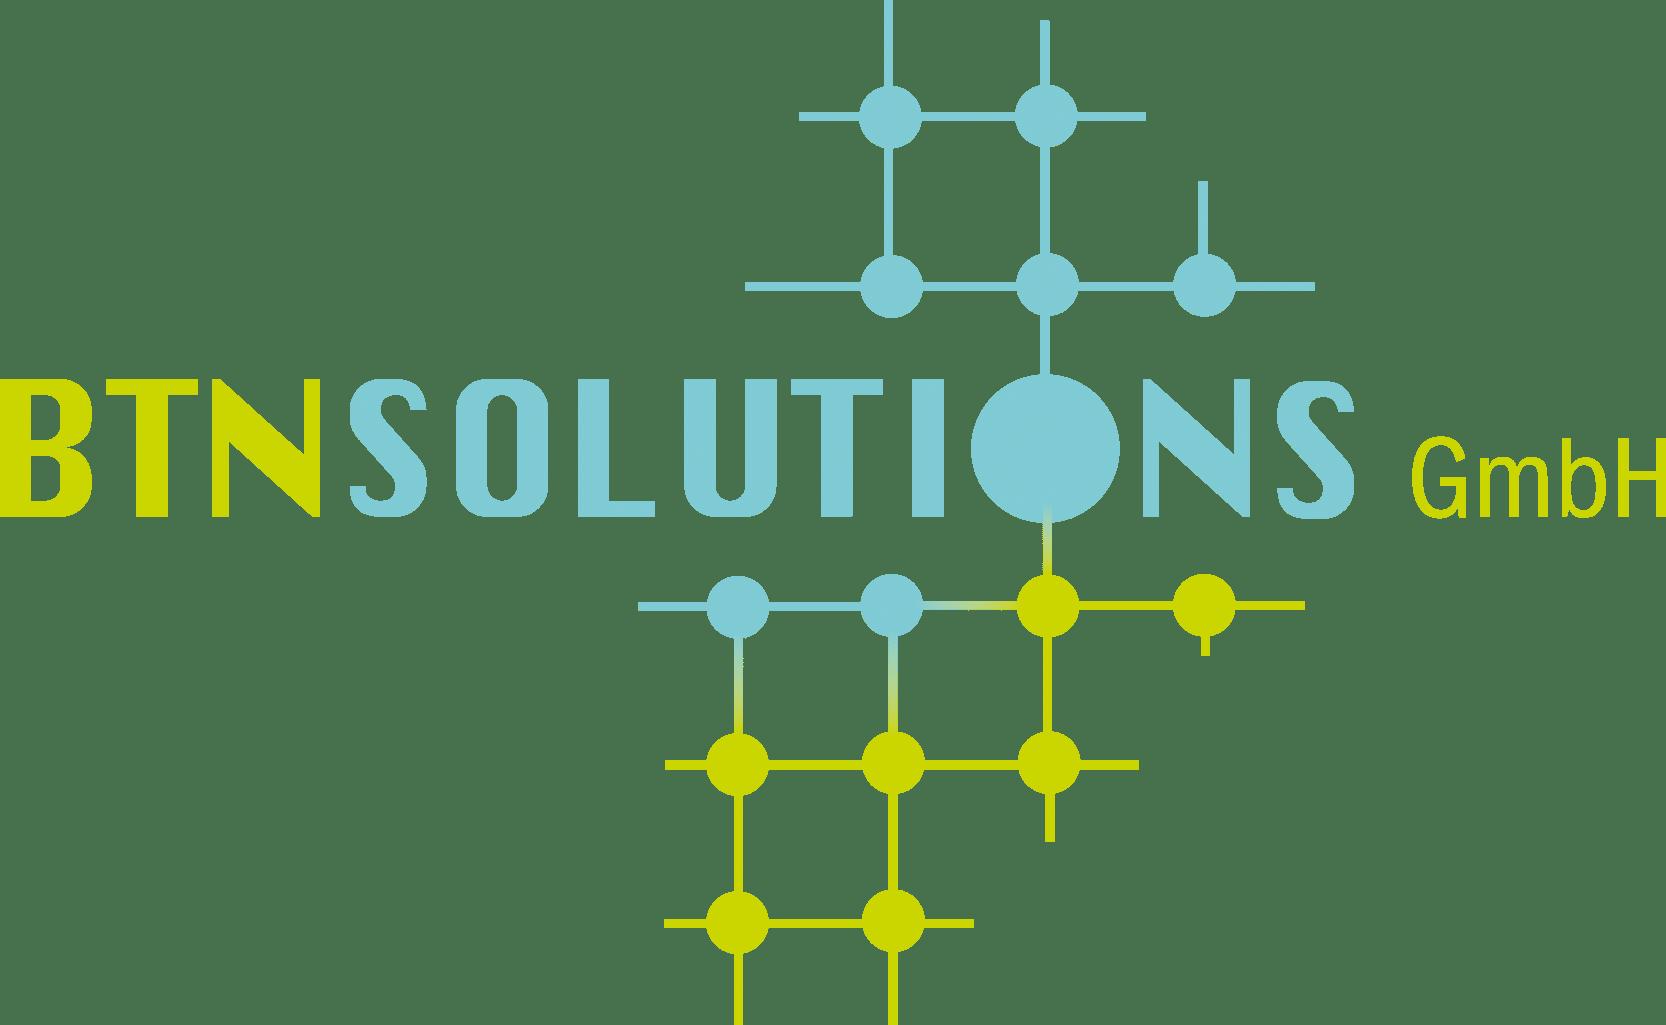 BTN-Solutions GmbH